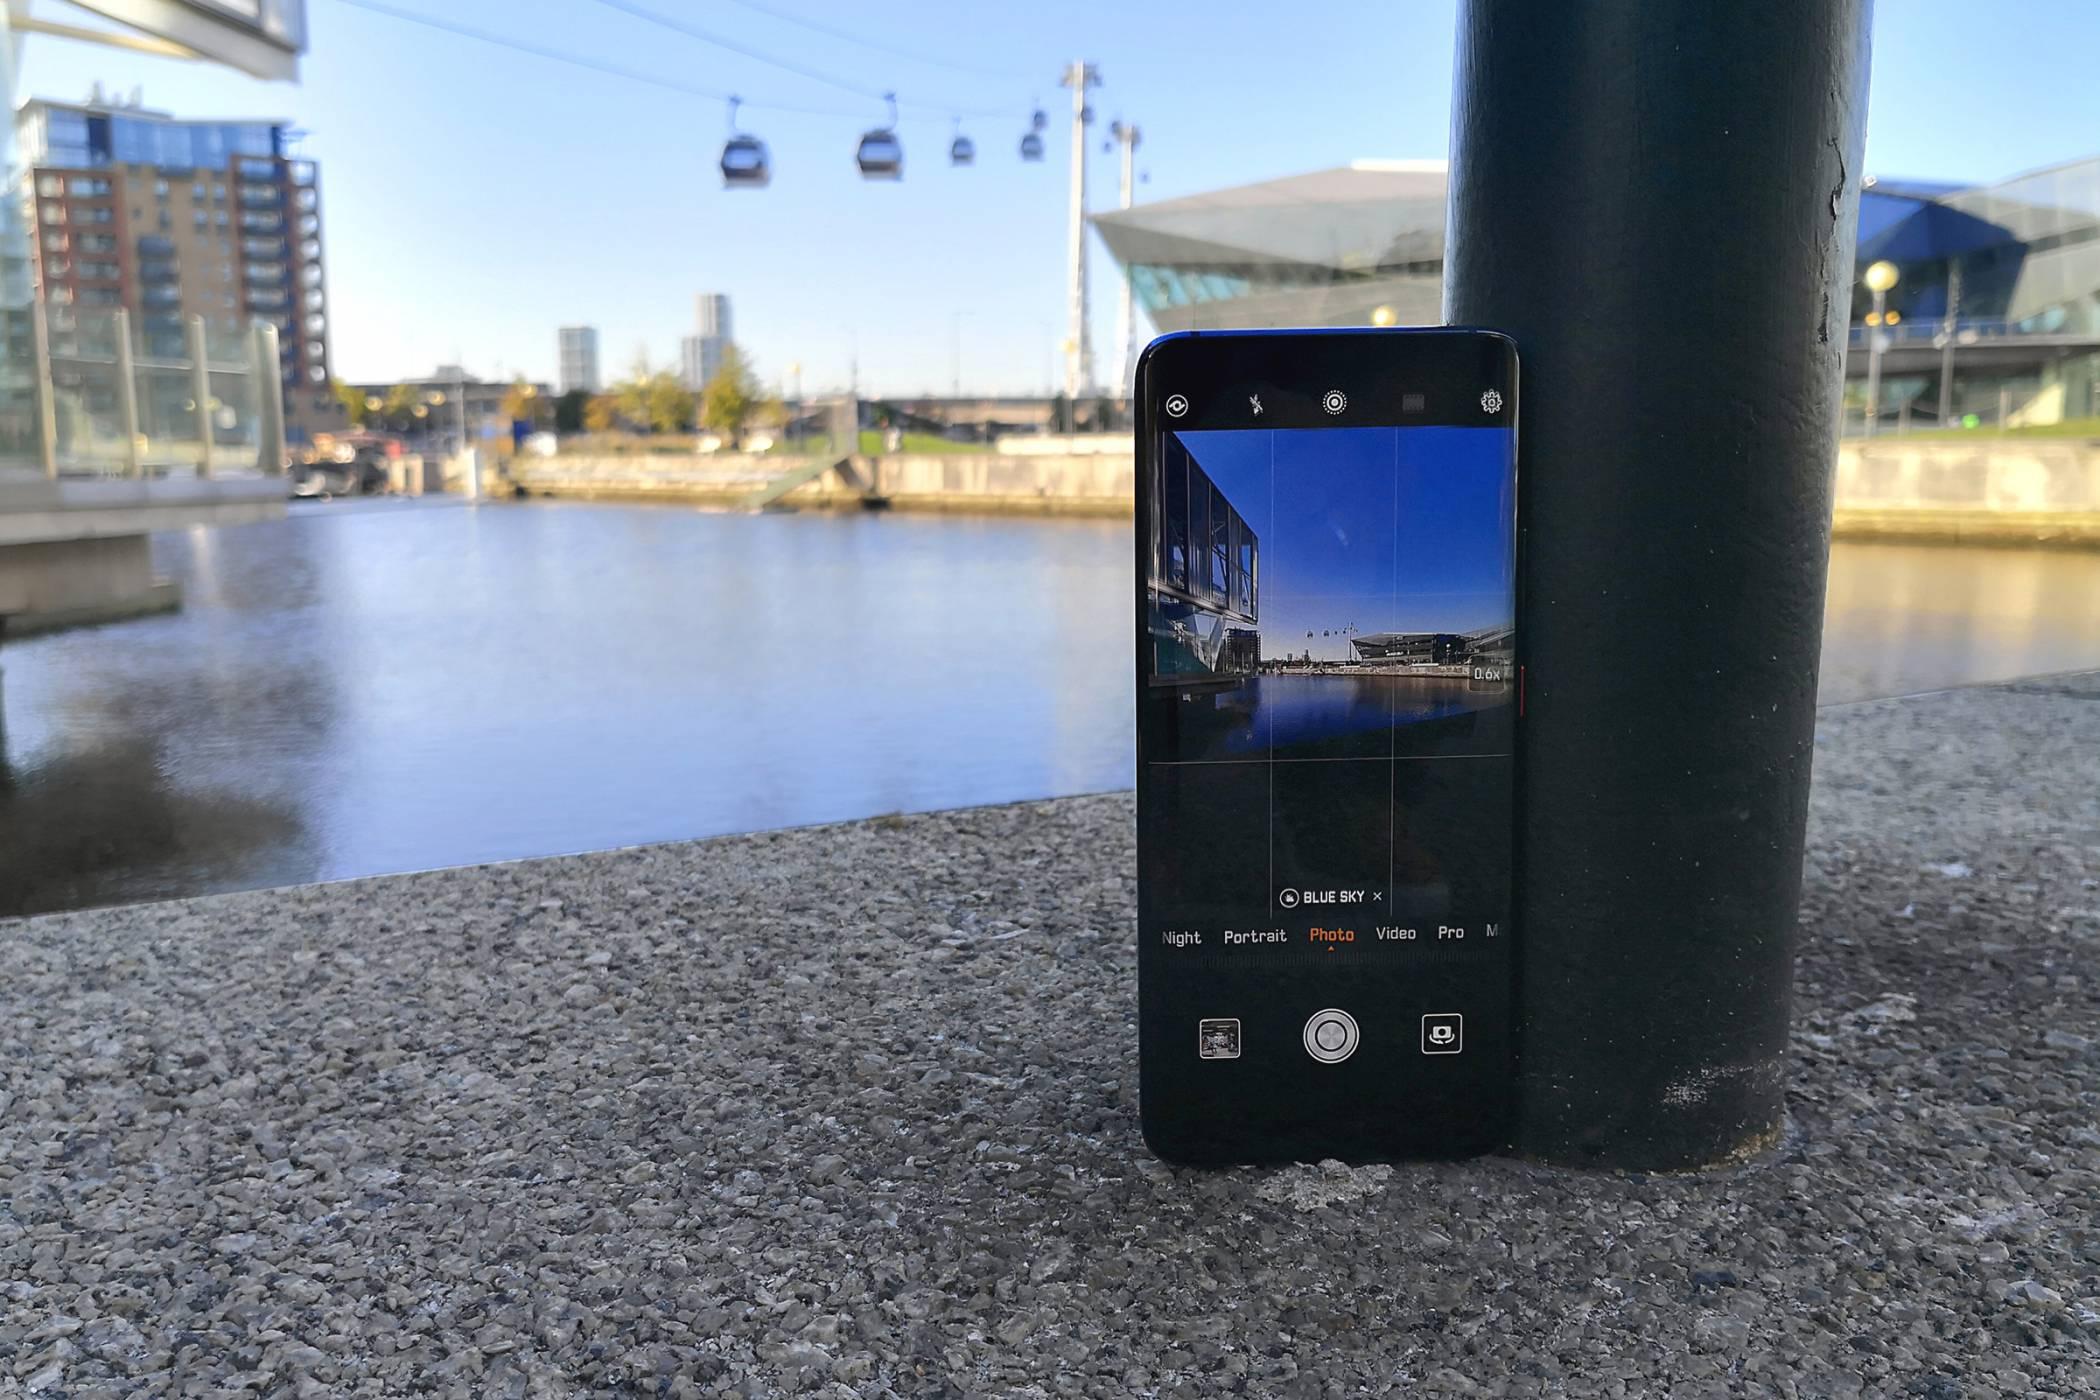 Huawei Mate 20 Pro: този телефон е страхотен (видео ревю)